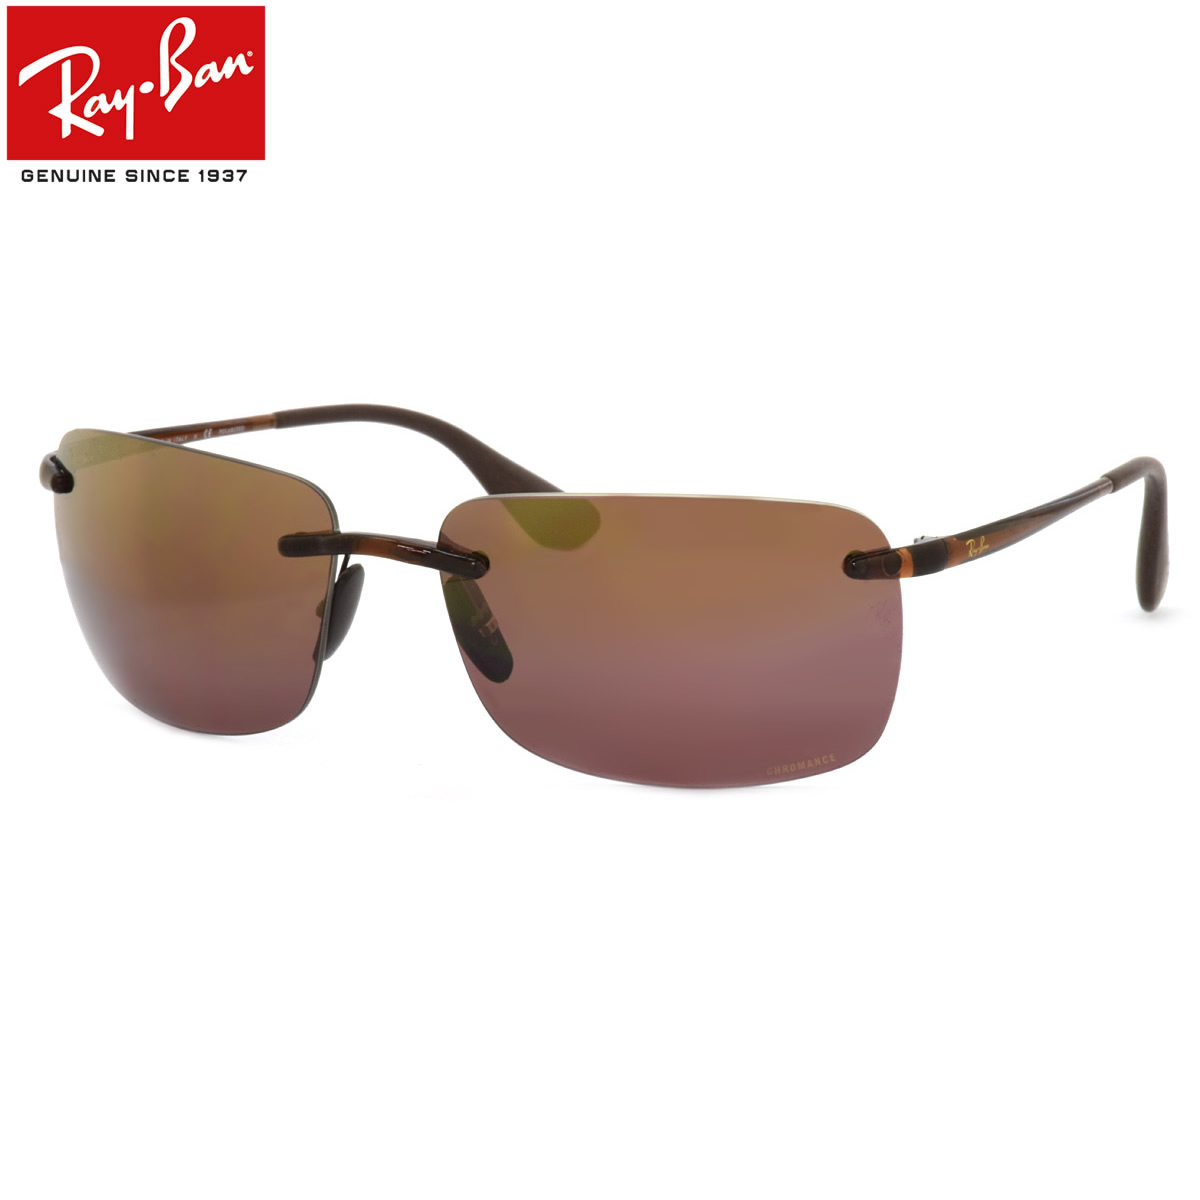 9bf8aee782 ... best price optical shop thats rakuten global market ray ban sunglasses  rb4255 604 6b f2f6e 56d54